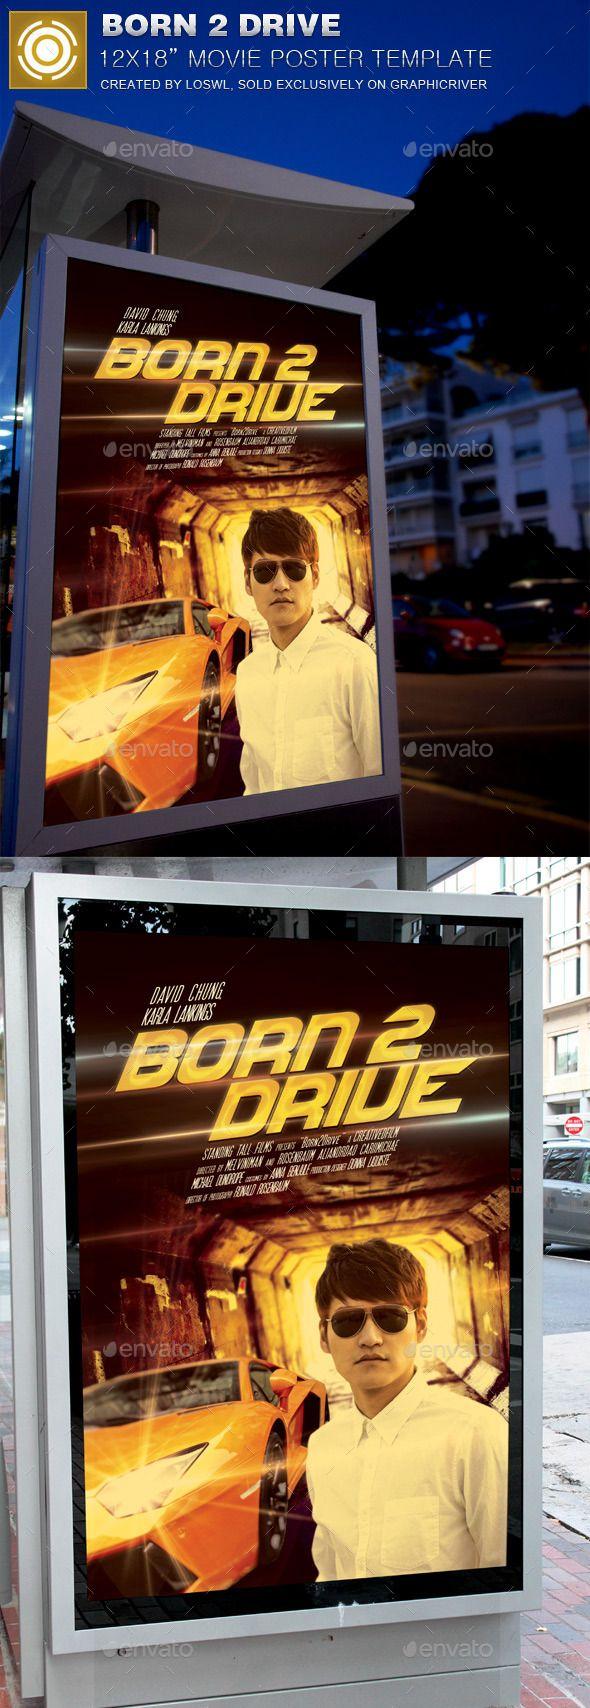 Born 2 Drive Movie Poster Template